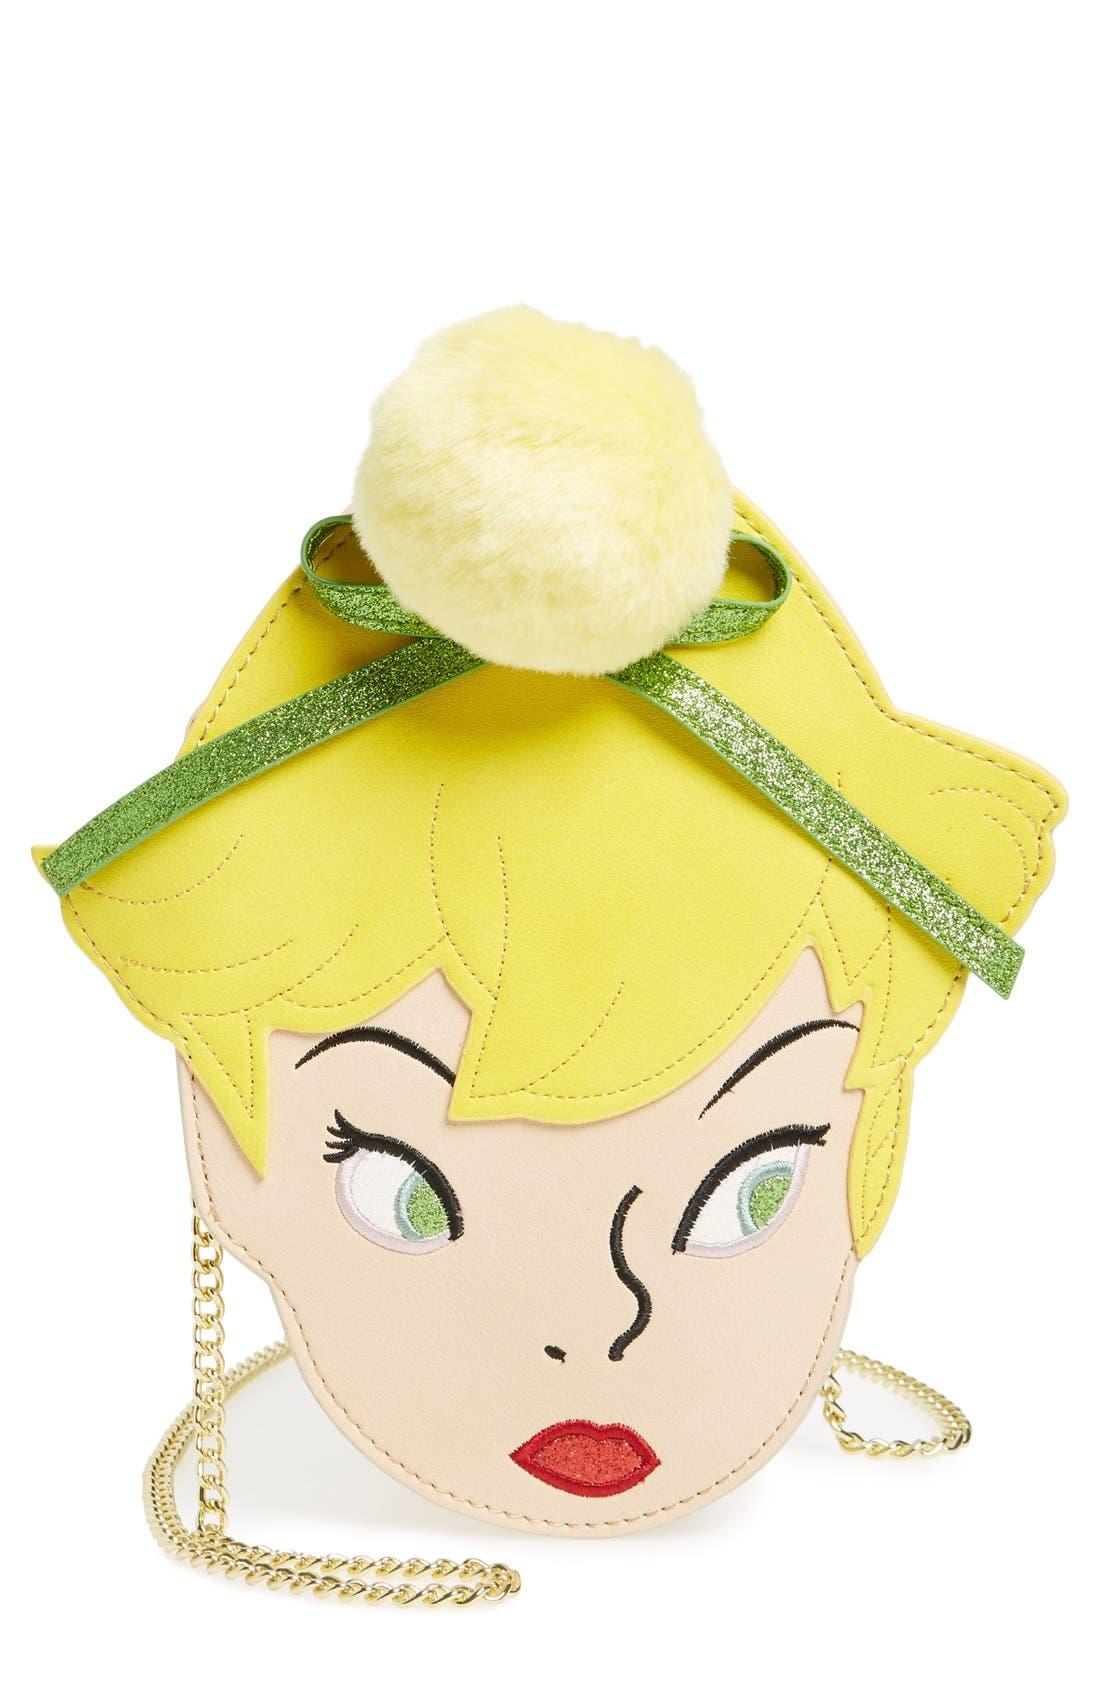 Alternate Image 1 Selected - Danielle Nicole x Disney® Tinker Bell Faux Leather Crossbody Bag